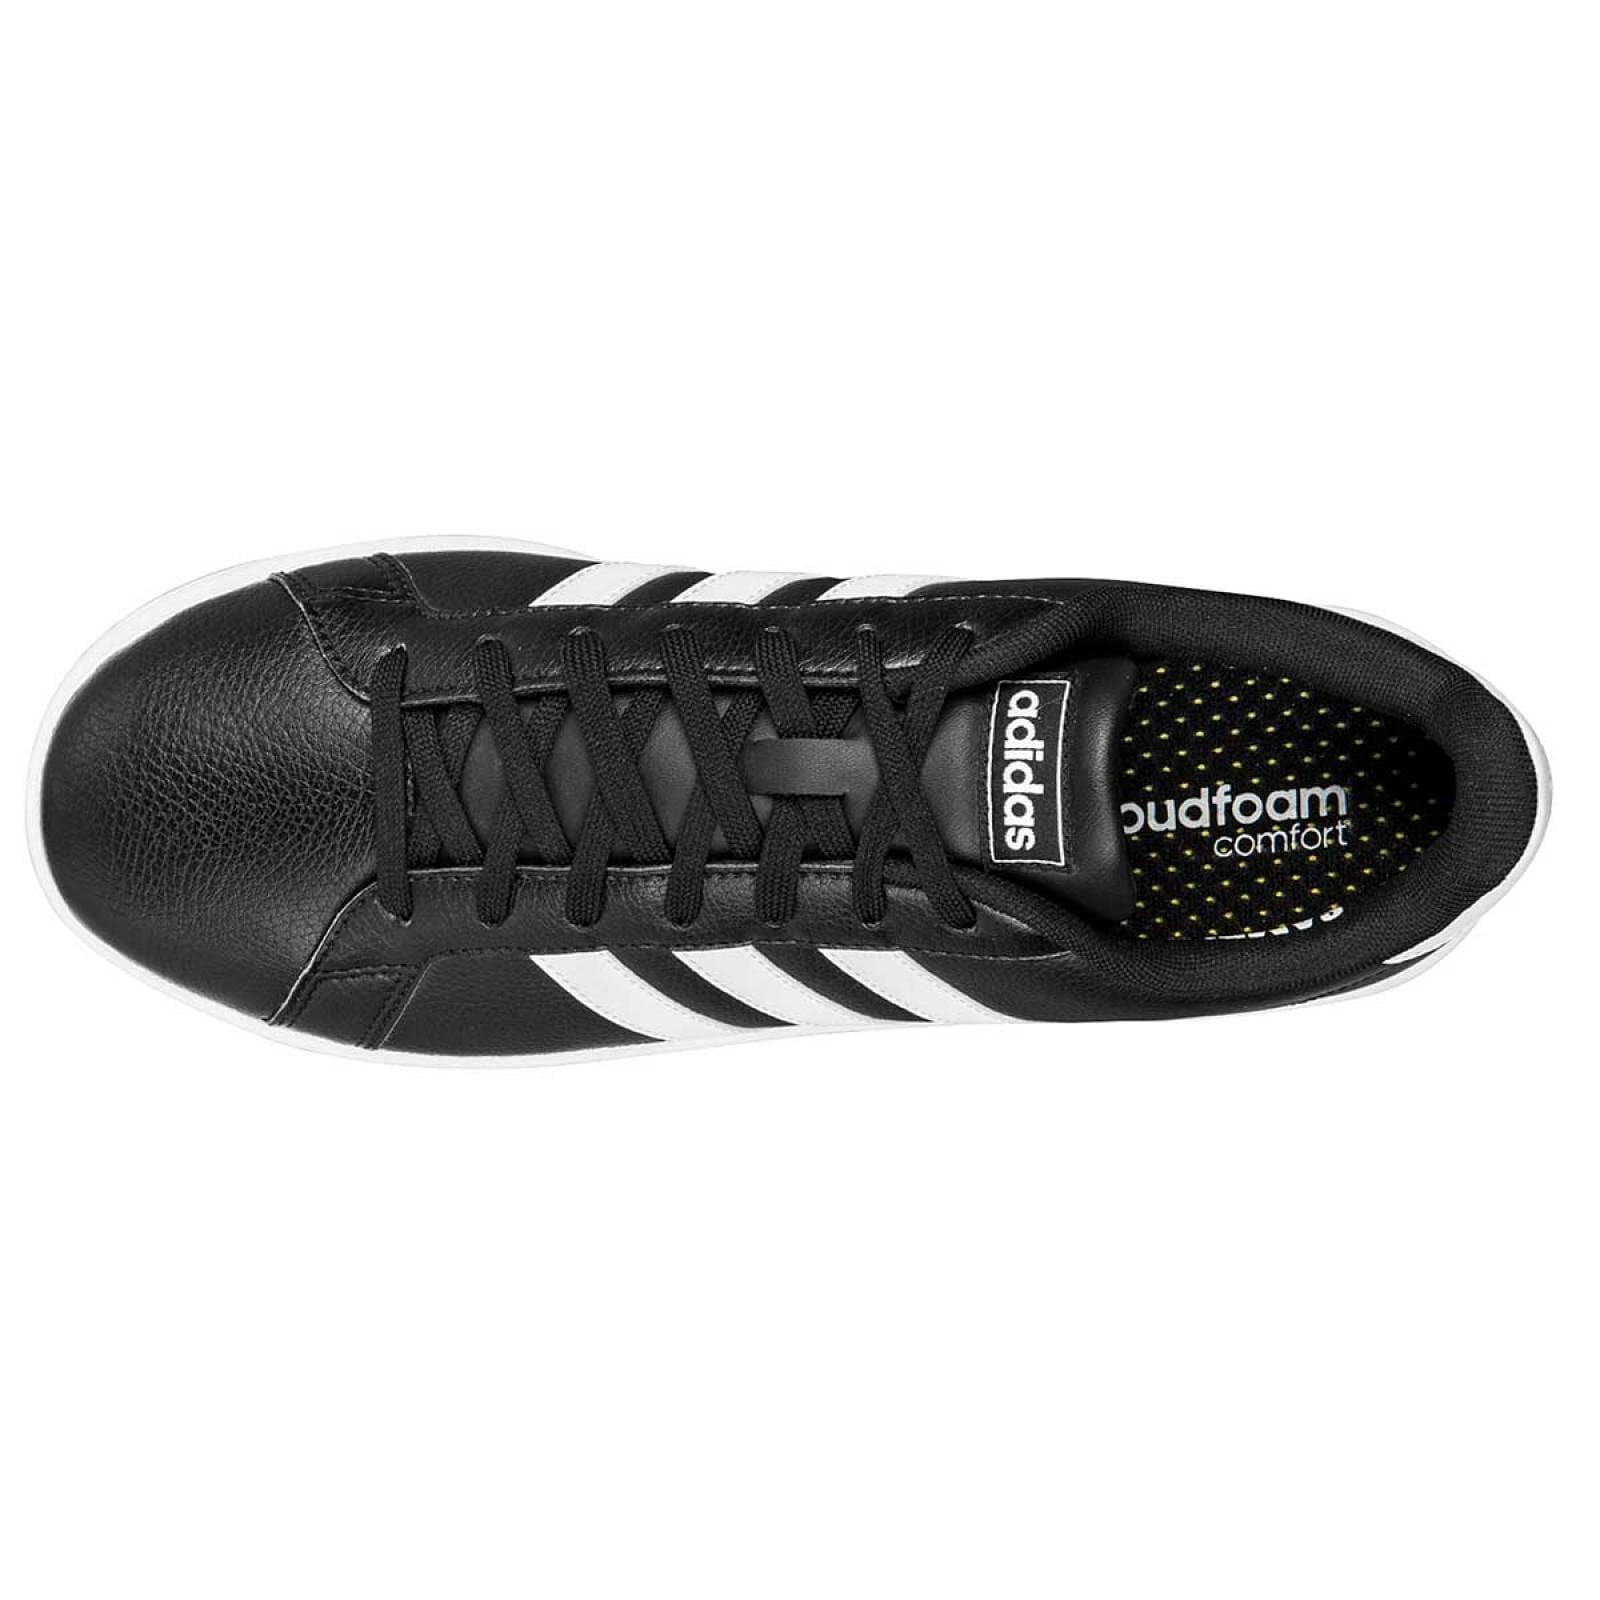 Adidas Tenis Hombre Negro blanco grand court